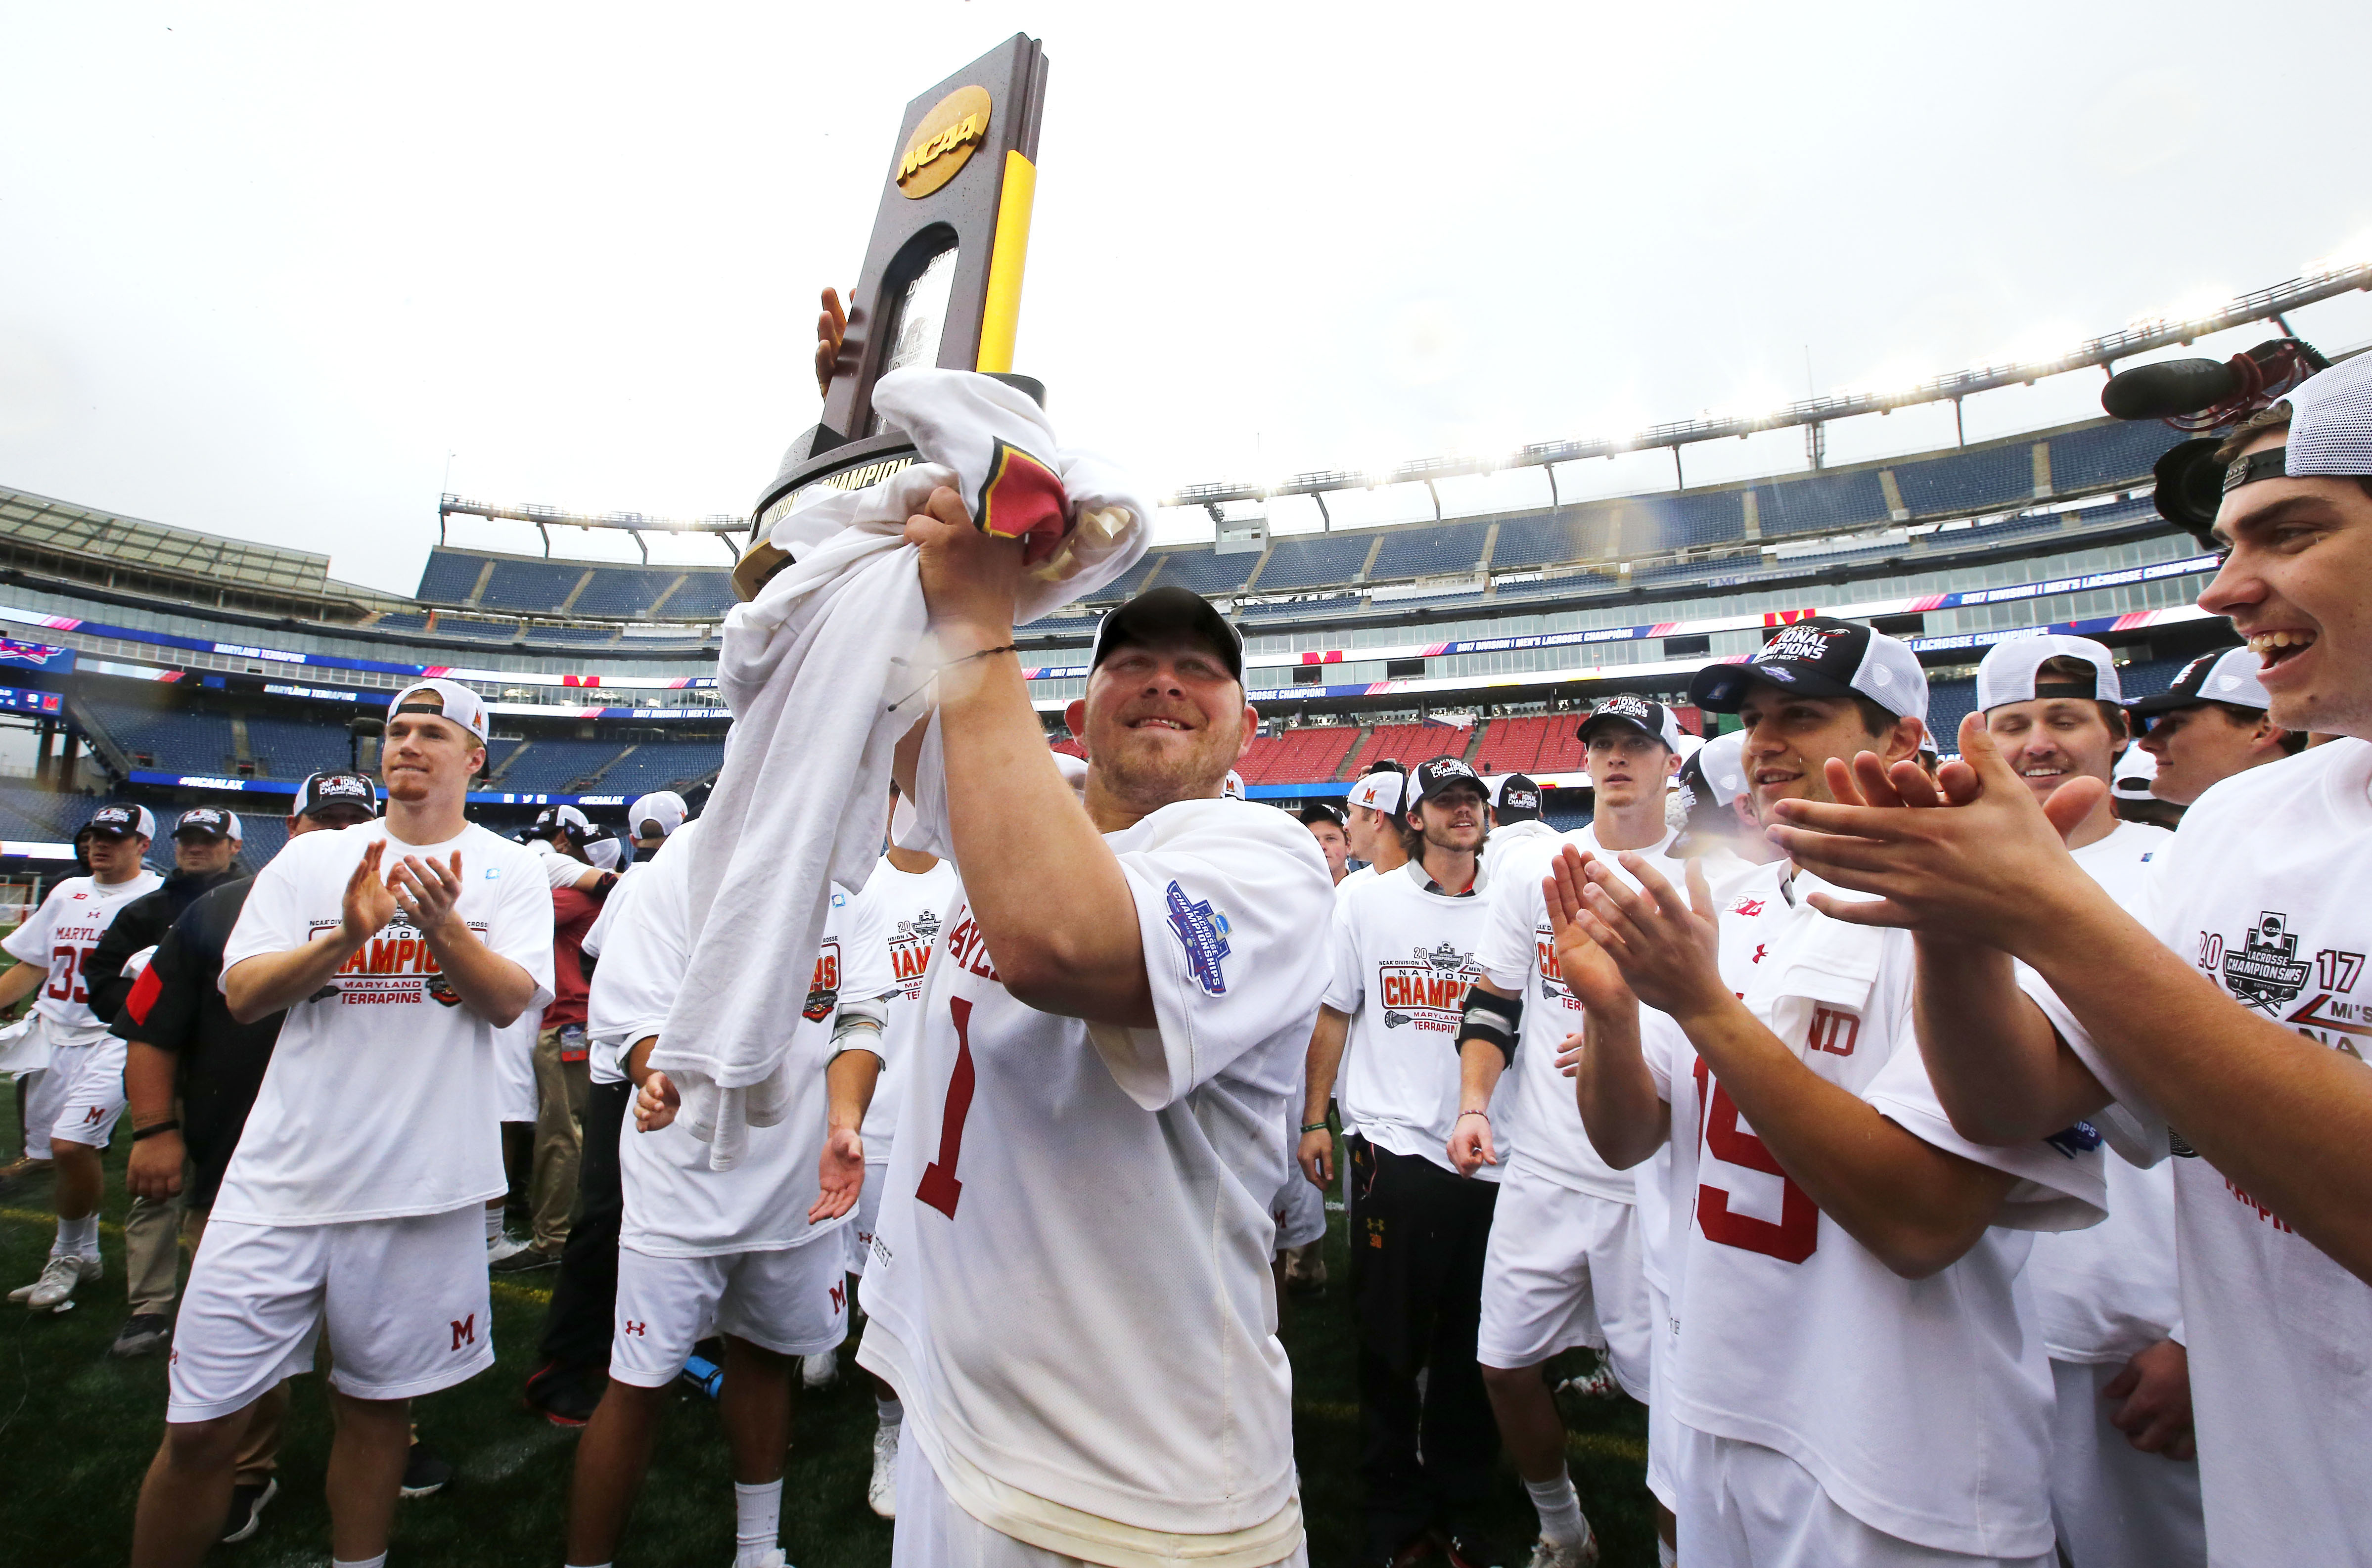 NCAA Lacrosse: Men's Championships